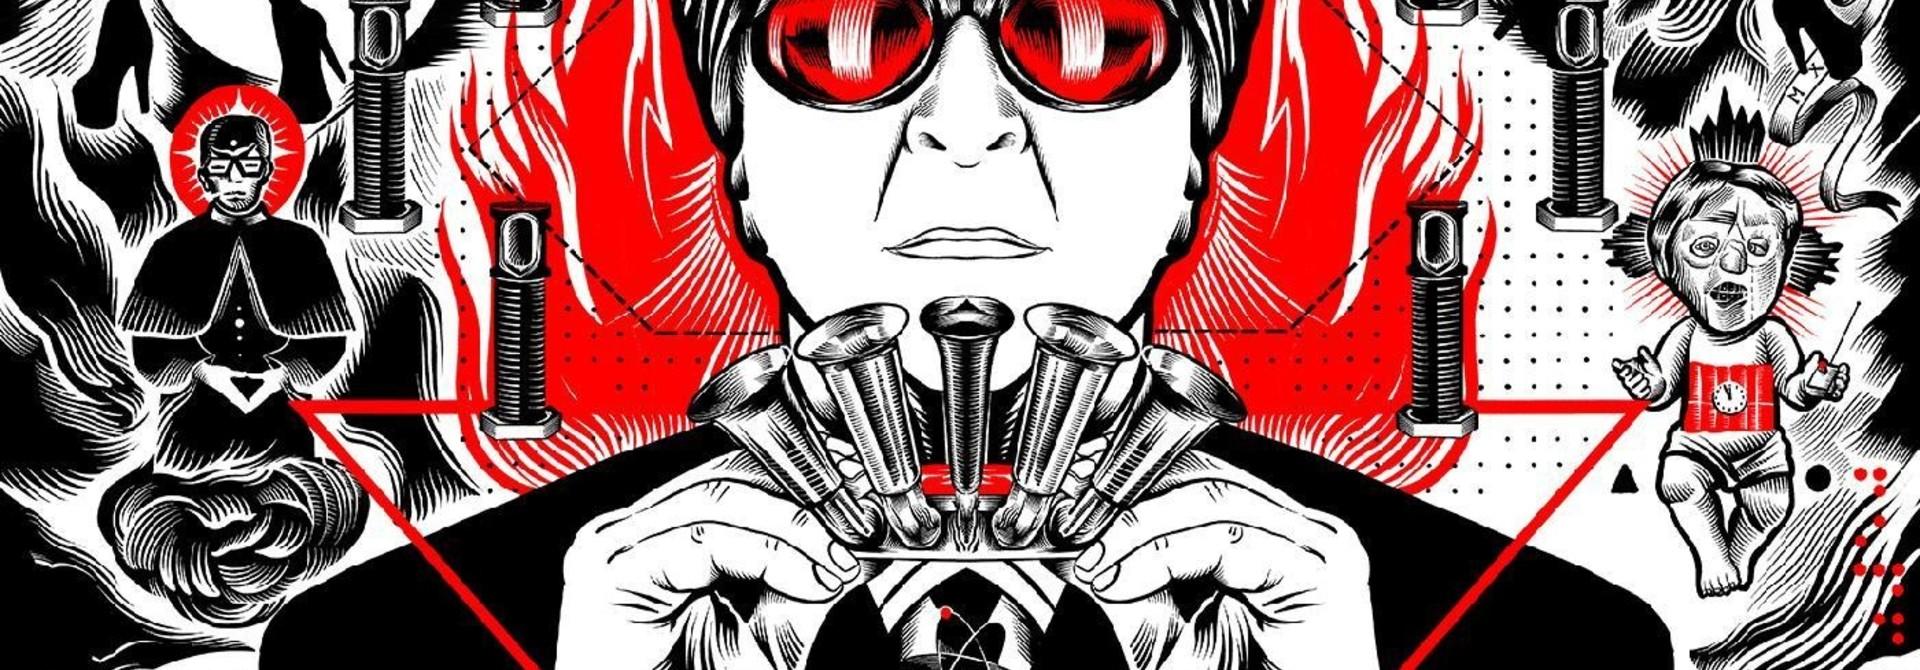 Devo's Gerald V. Casale • AKA Jihad Jerry & The Evildoers (RSD2021)